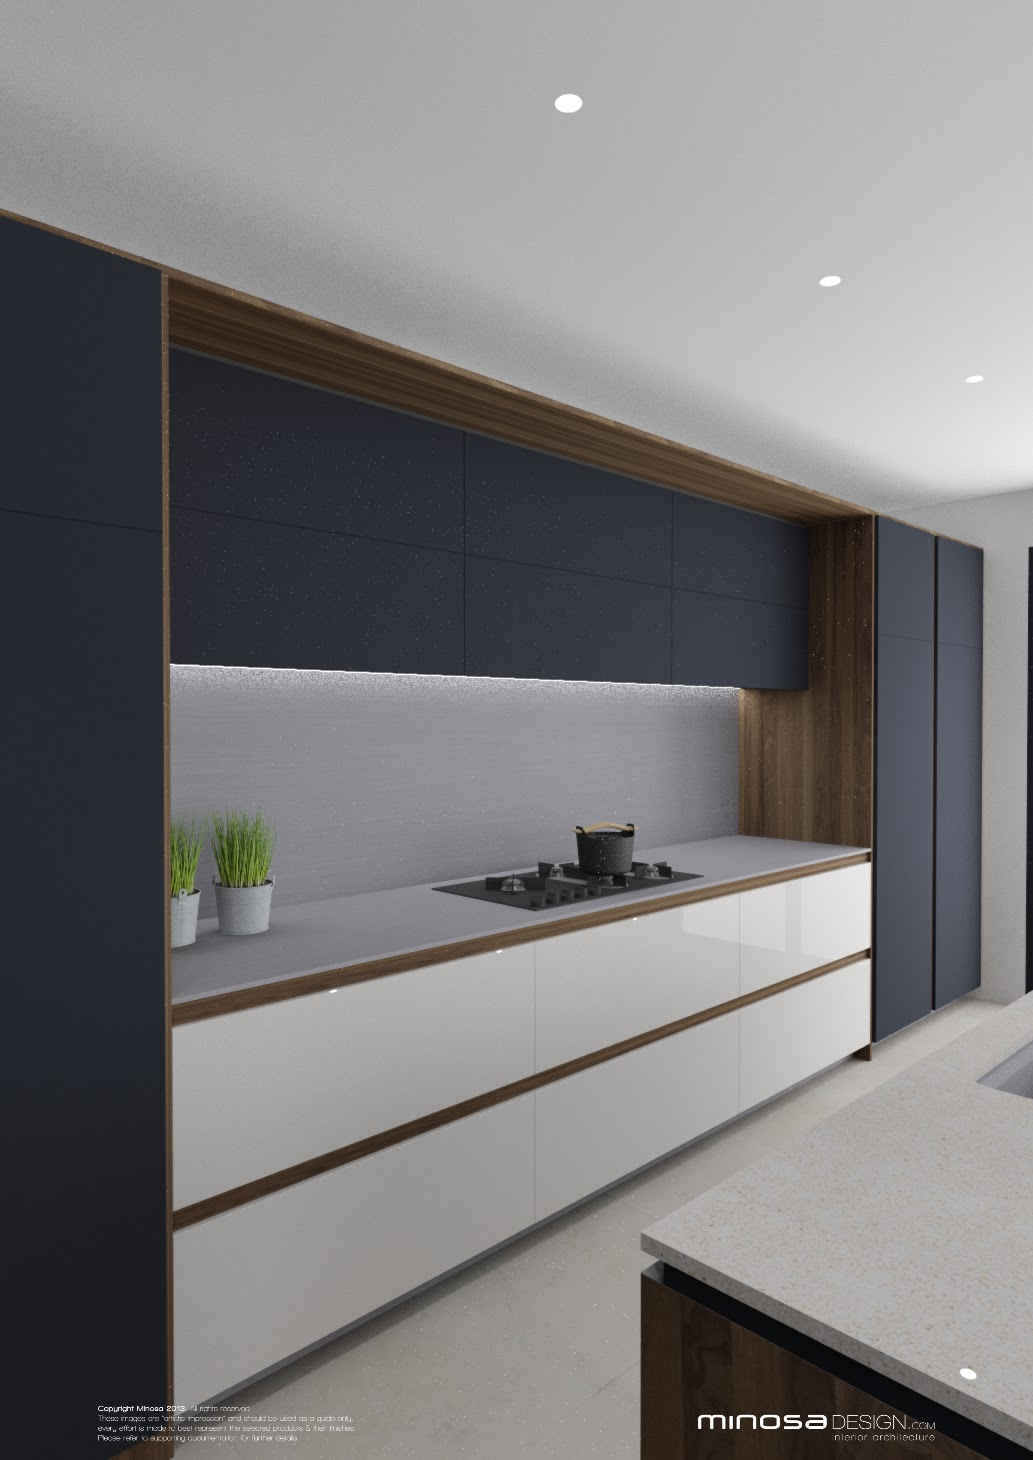 Minosa striking kitchen design with rich wood copper for White copper kitchen